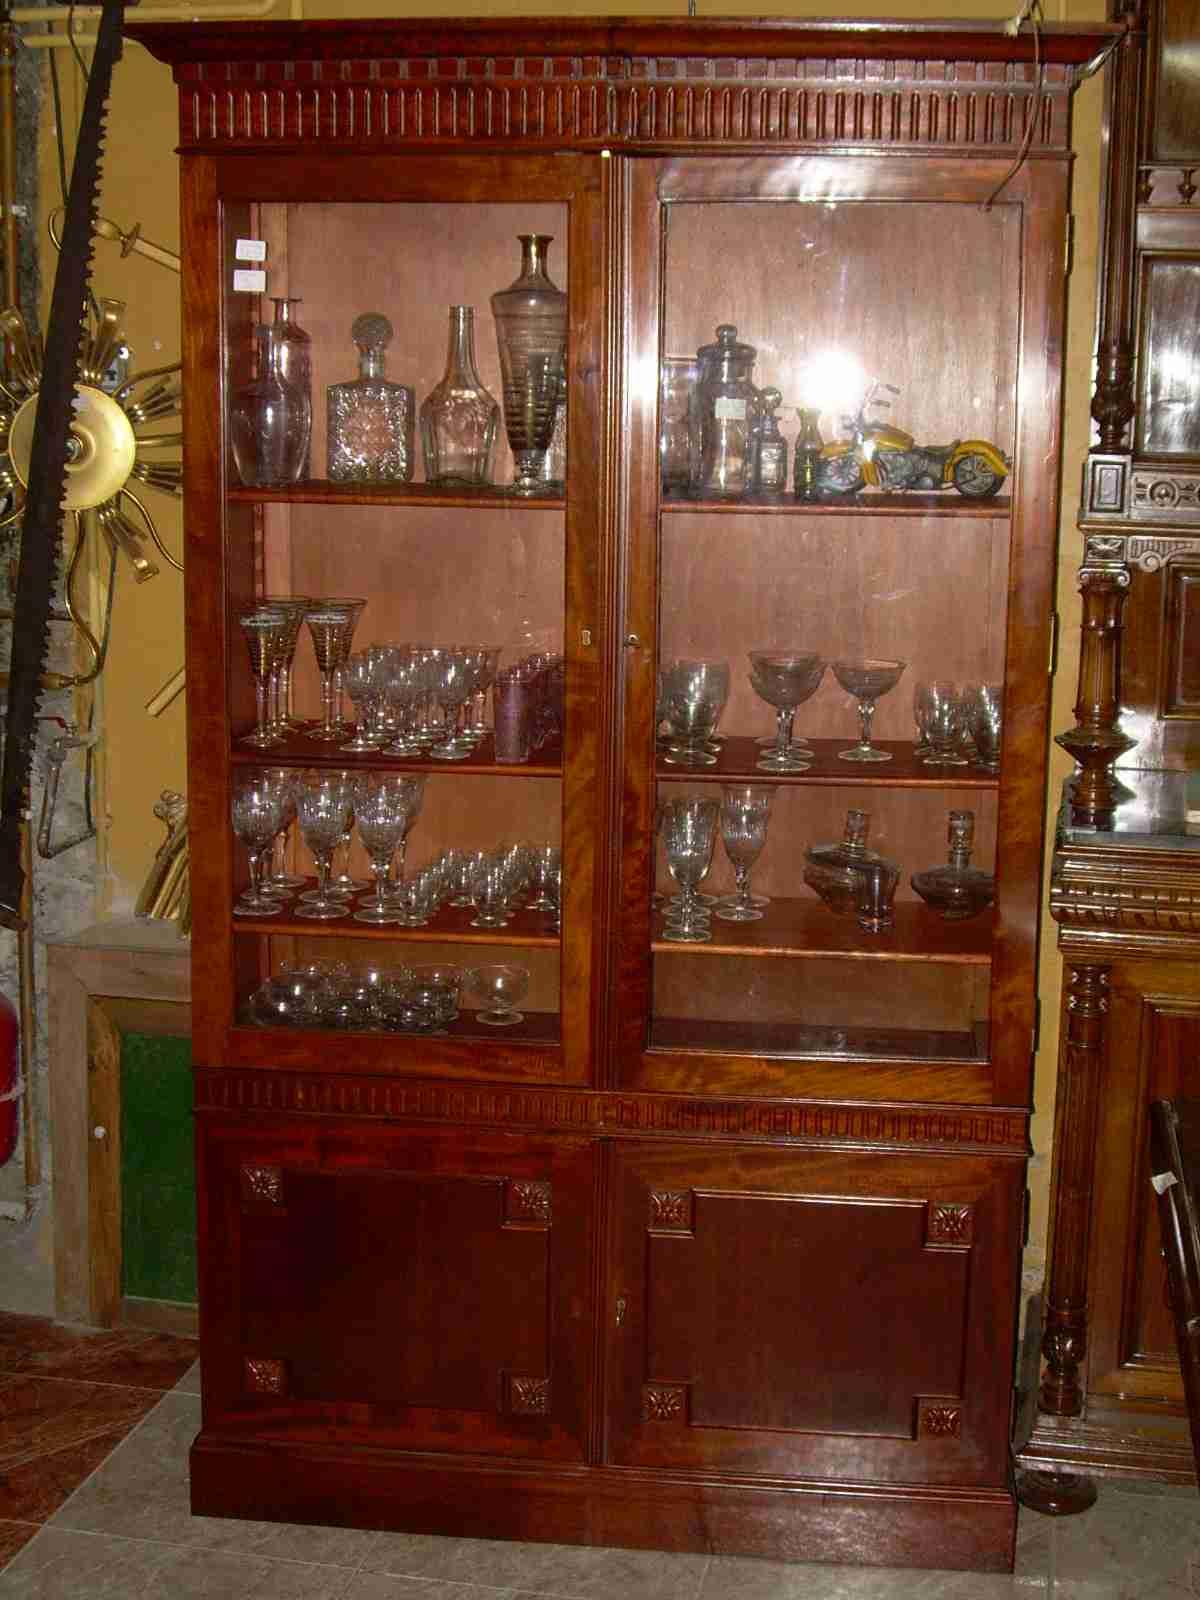 Trincheros de madera contemporaneos idee per interni e for Comedores y vitrinas de madera